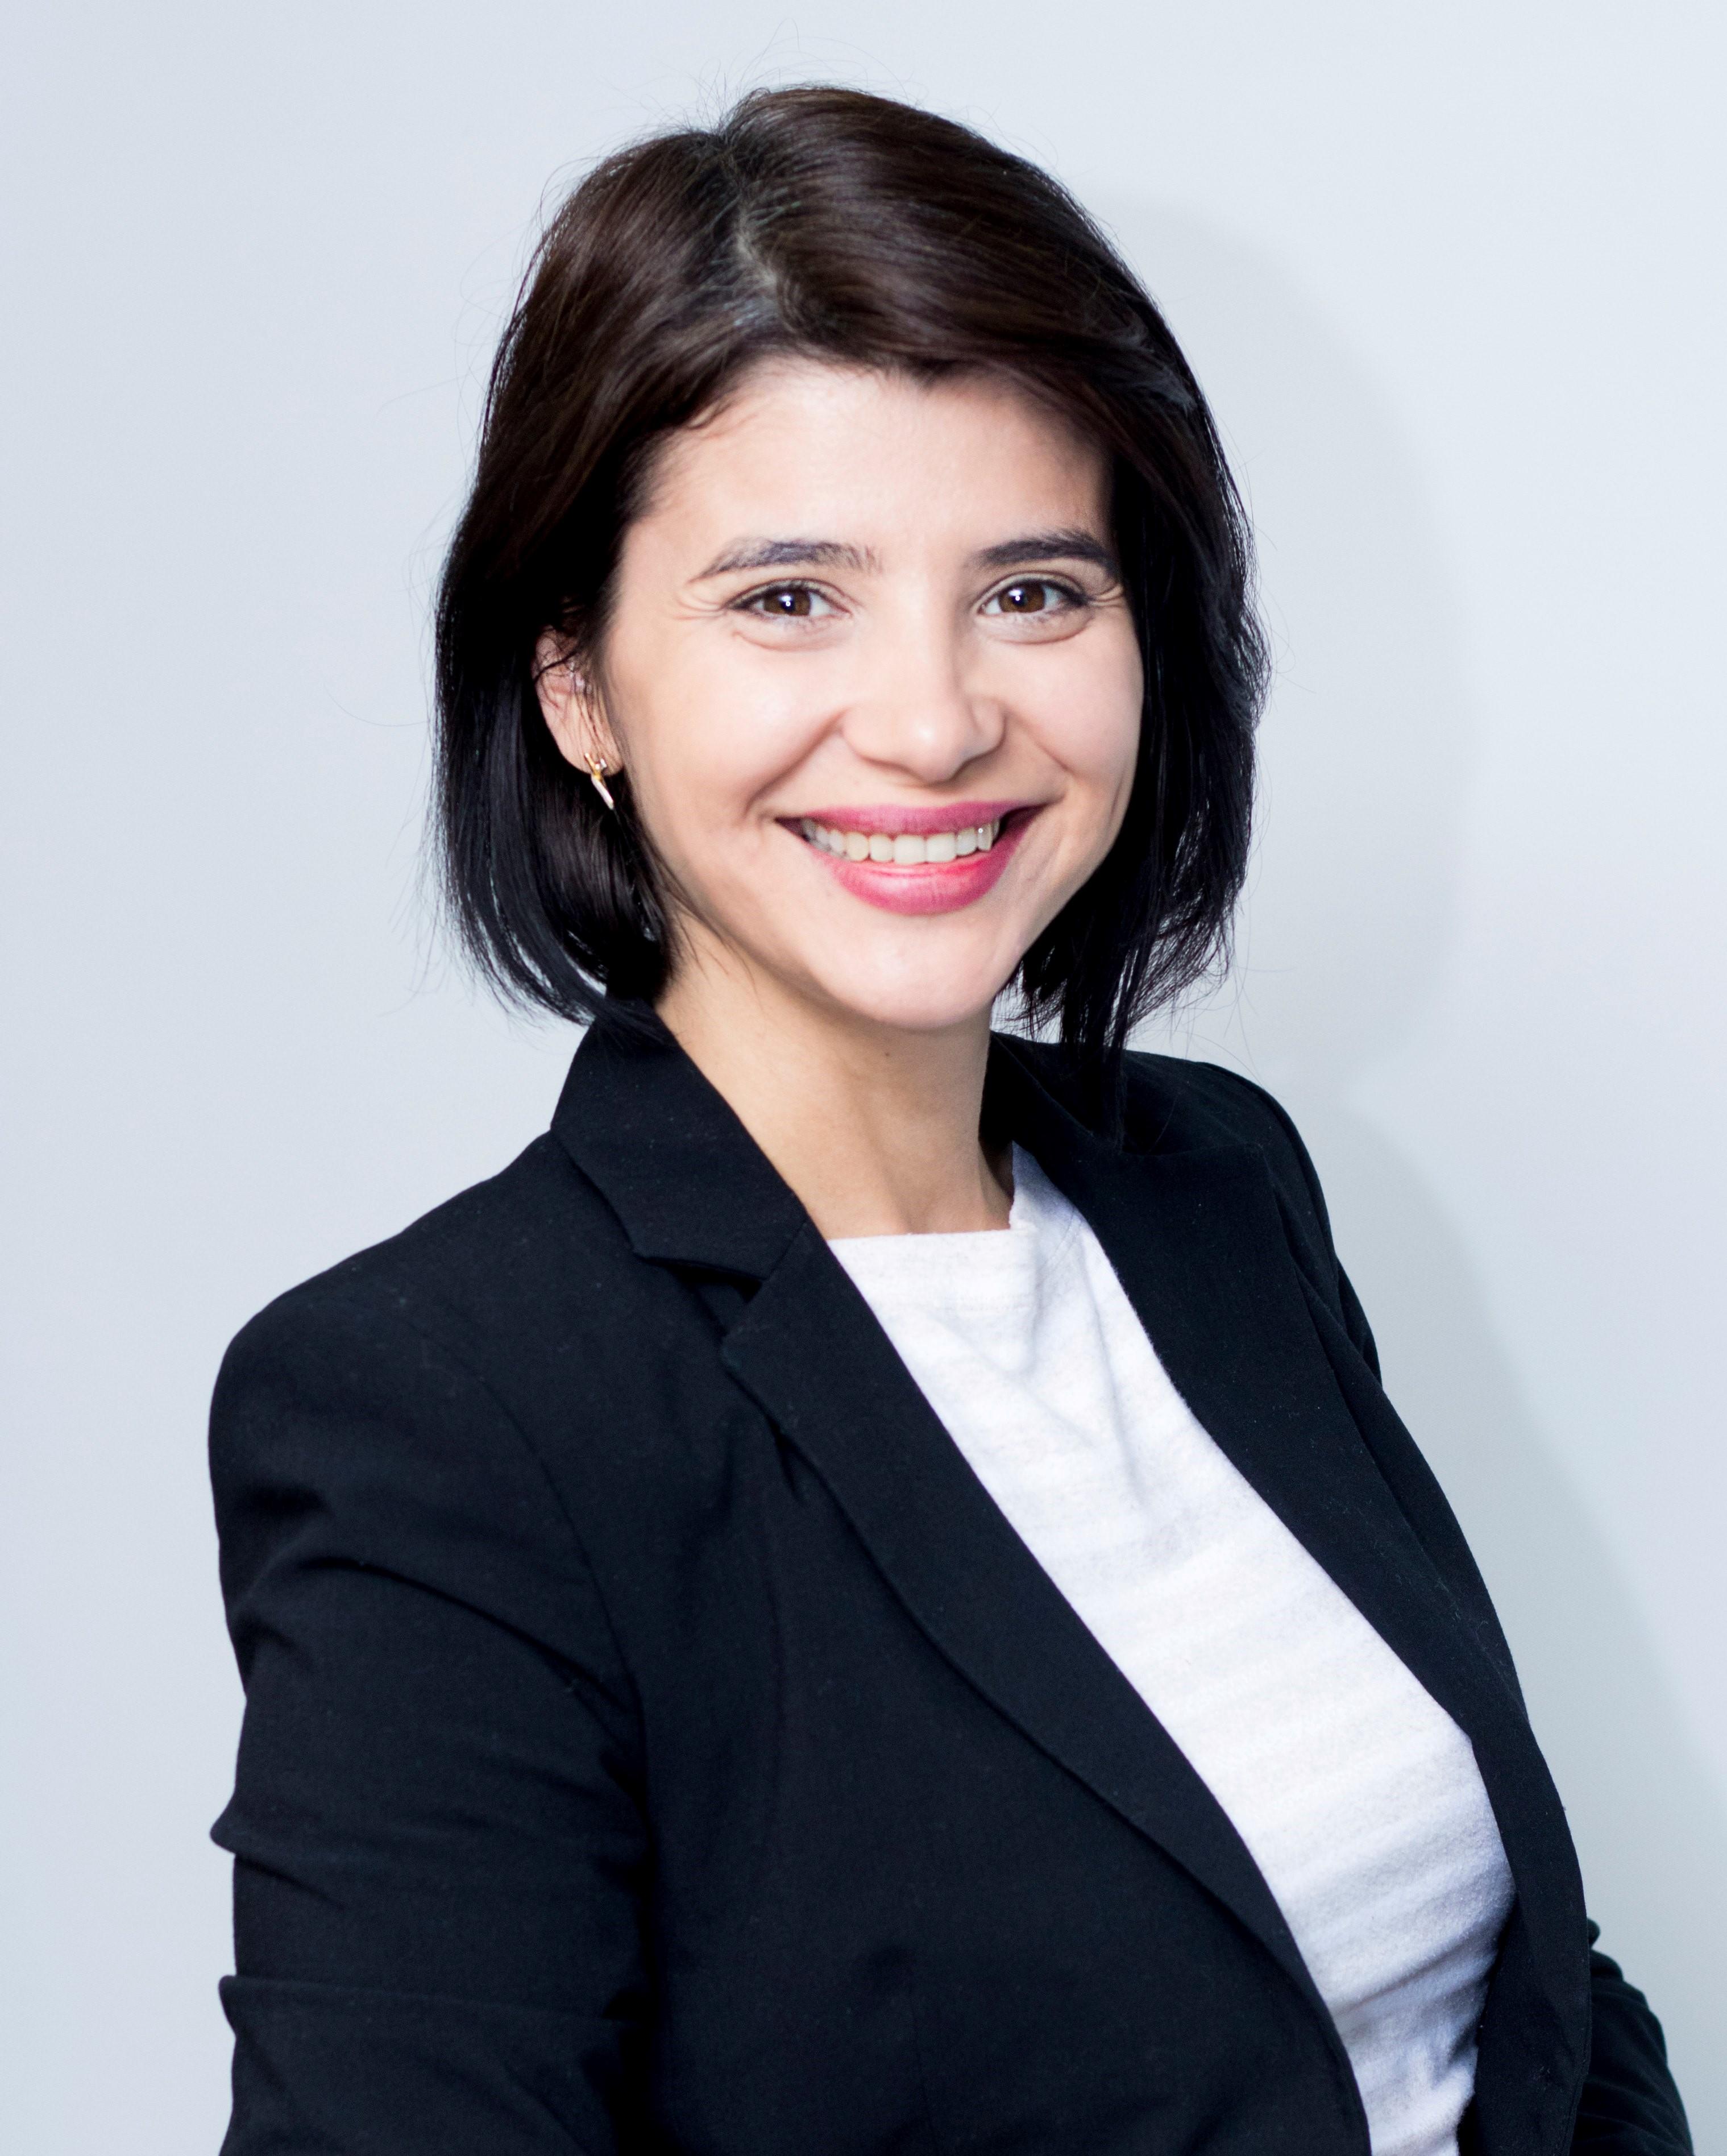 Cristina Nicolescu